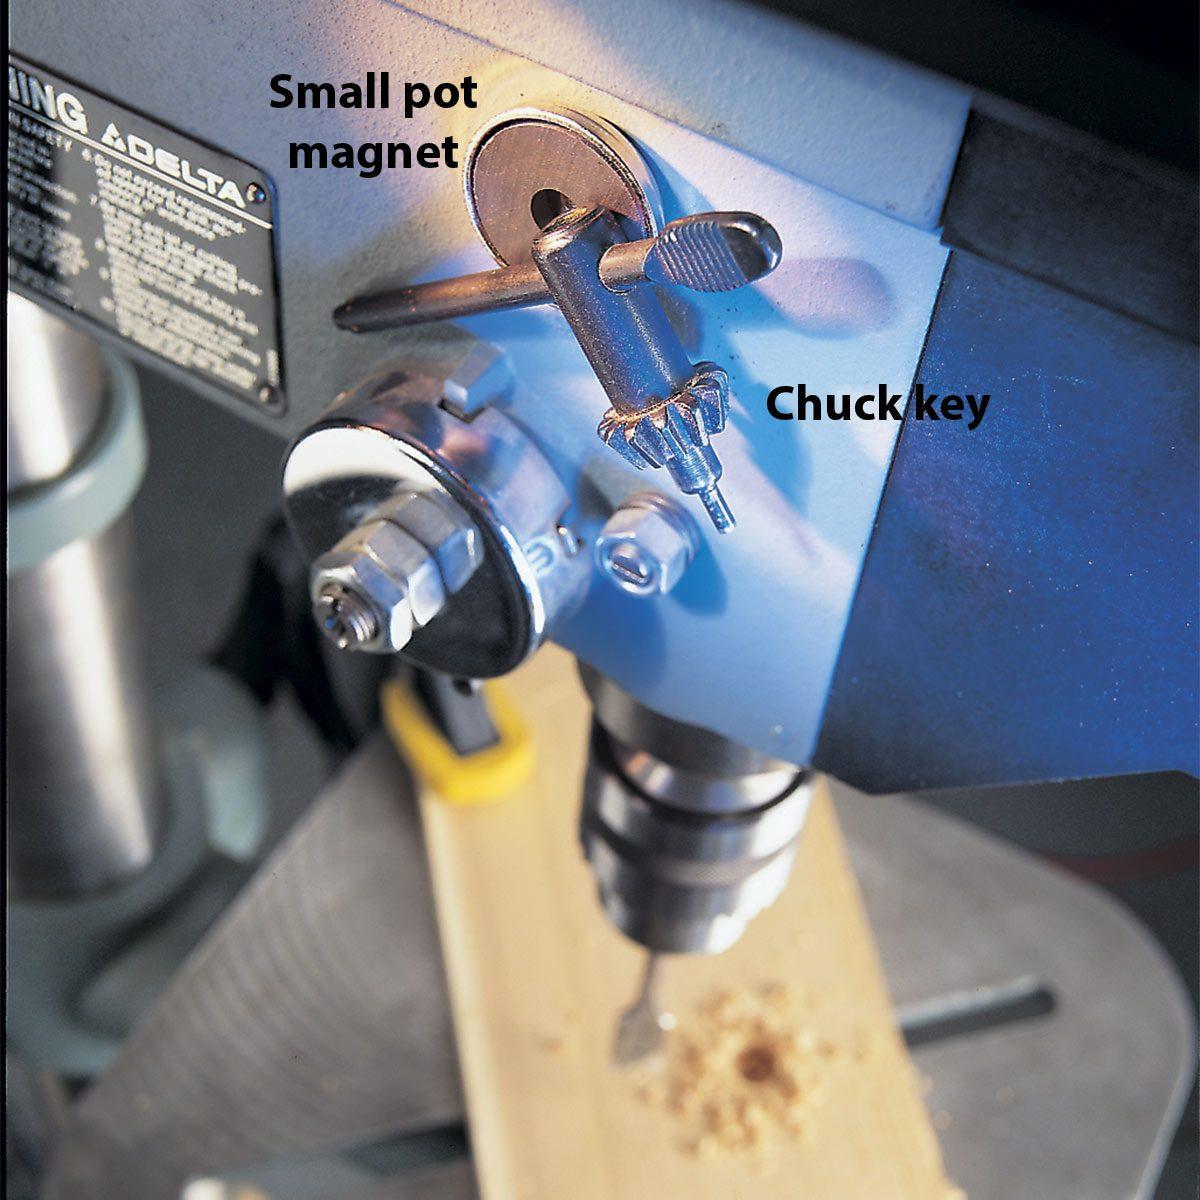 chuck key magnet